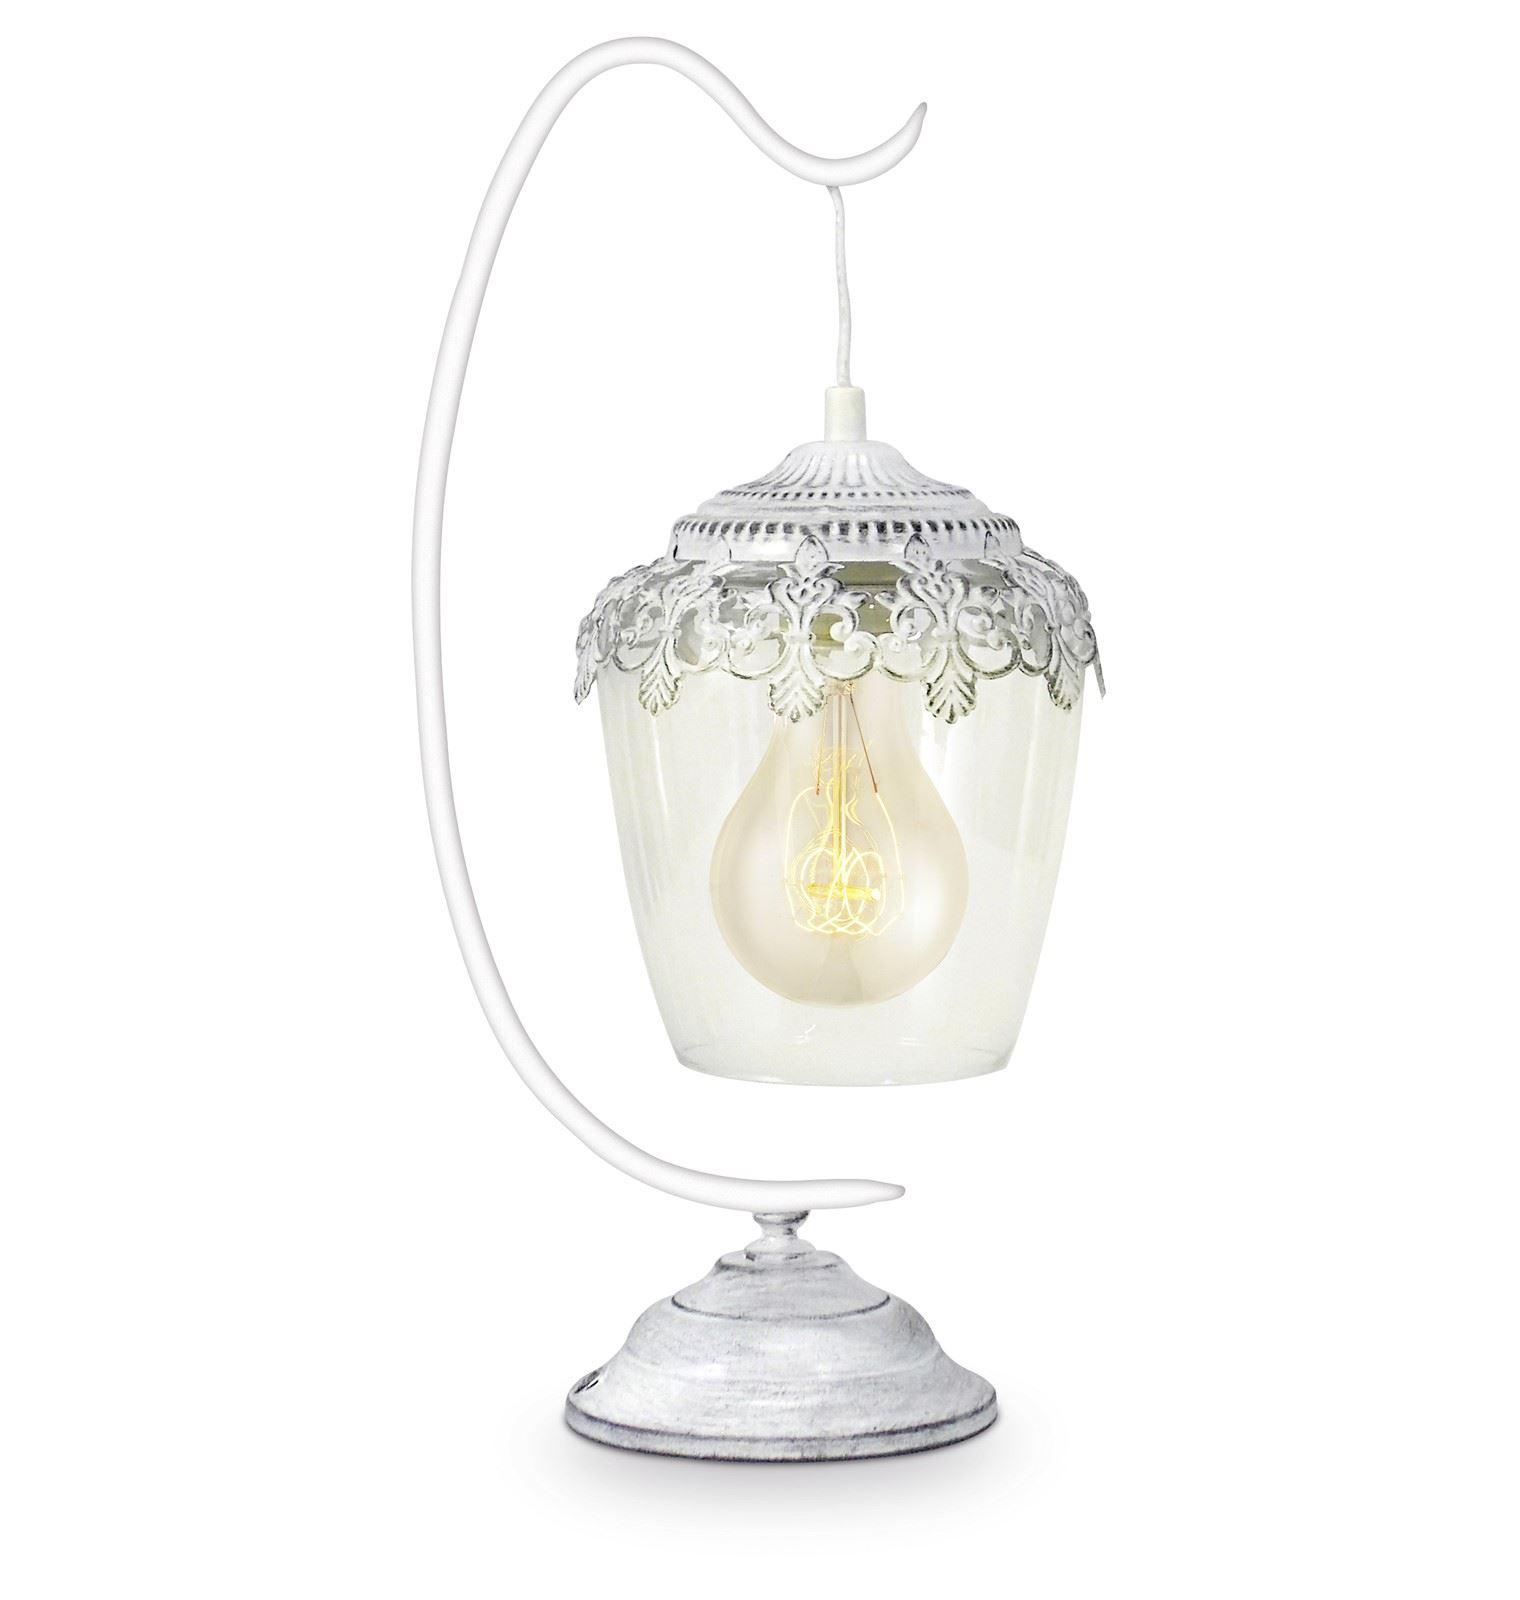 Sudbury Decorative Table Lamp 1 Light E27 White Patina